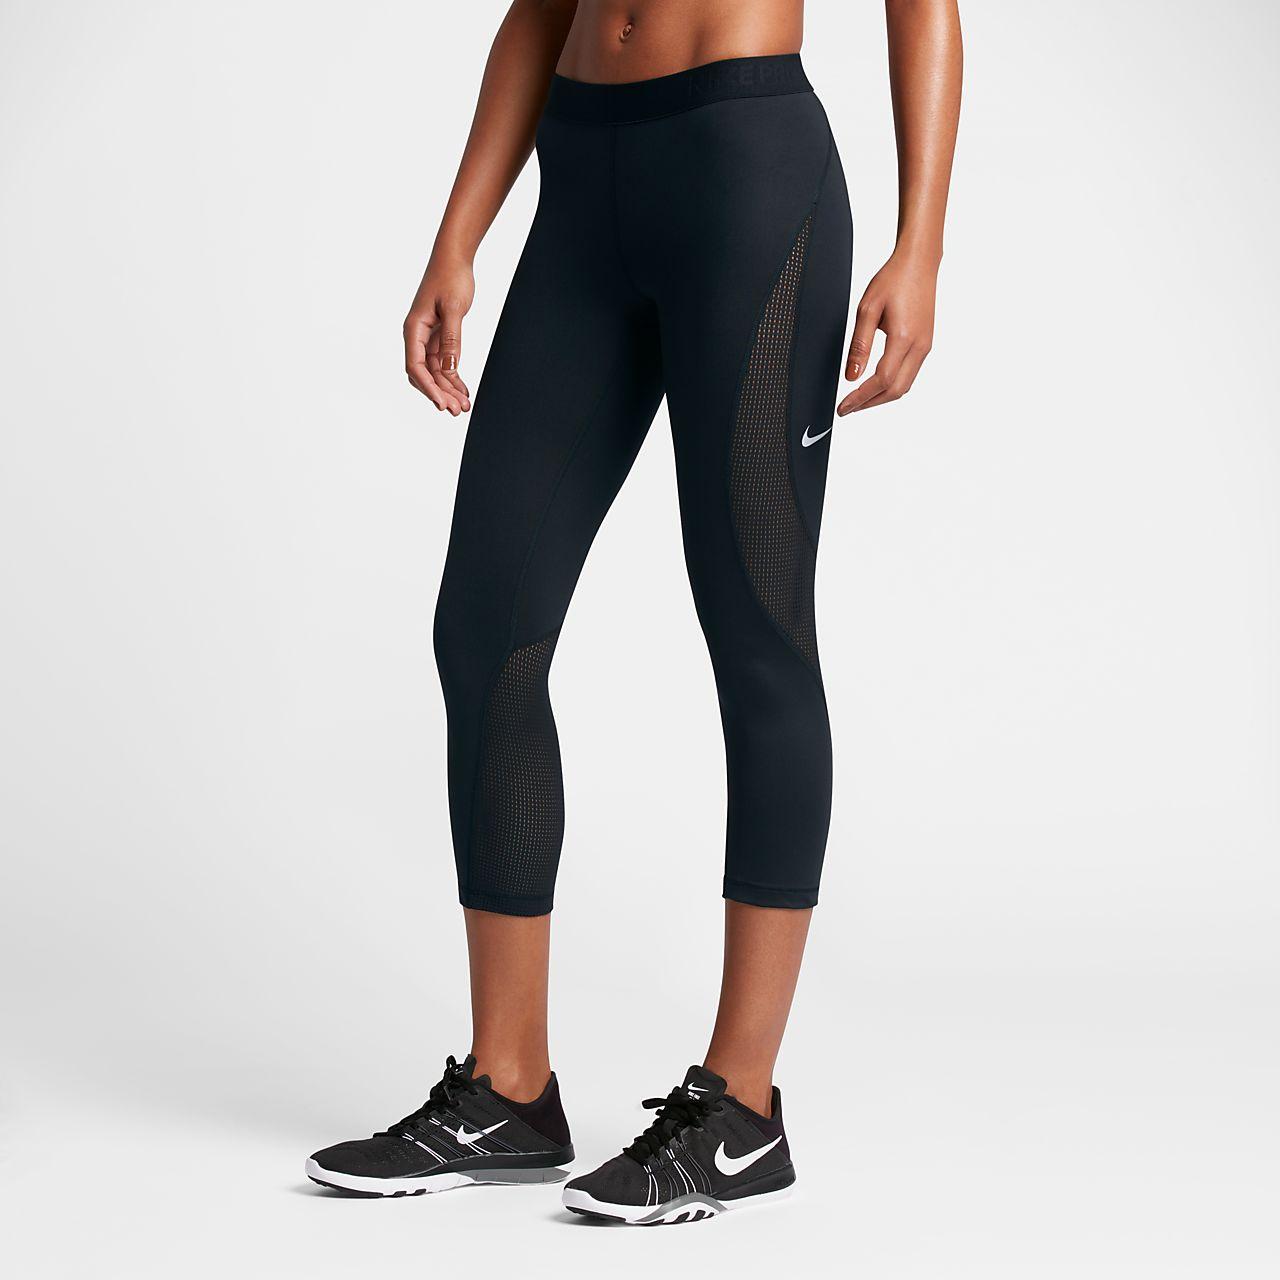 Nike Pro HyperCool Women's Capris Black/Pure Platinum